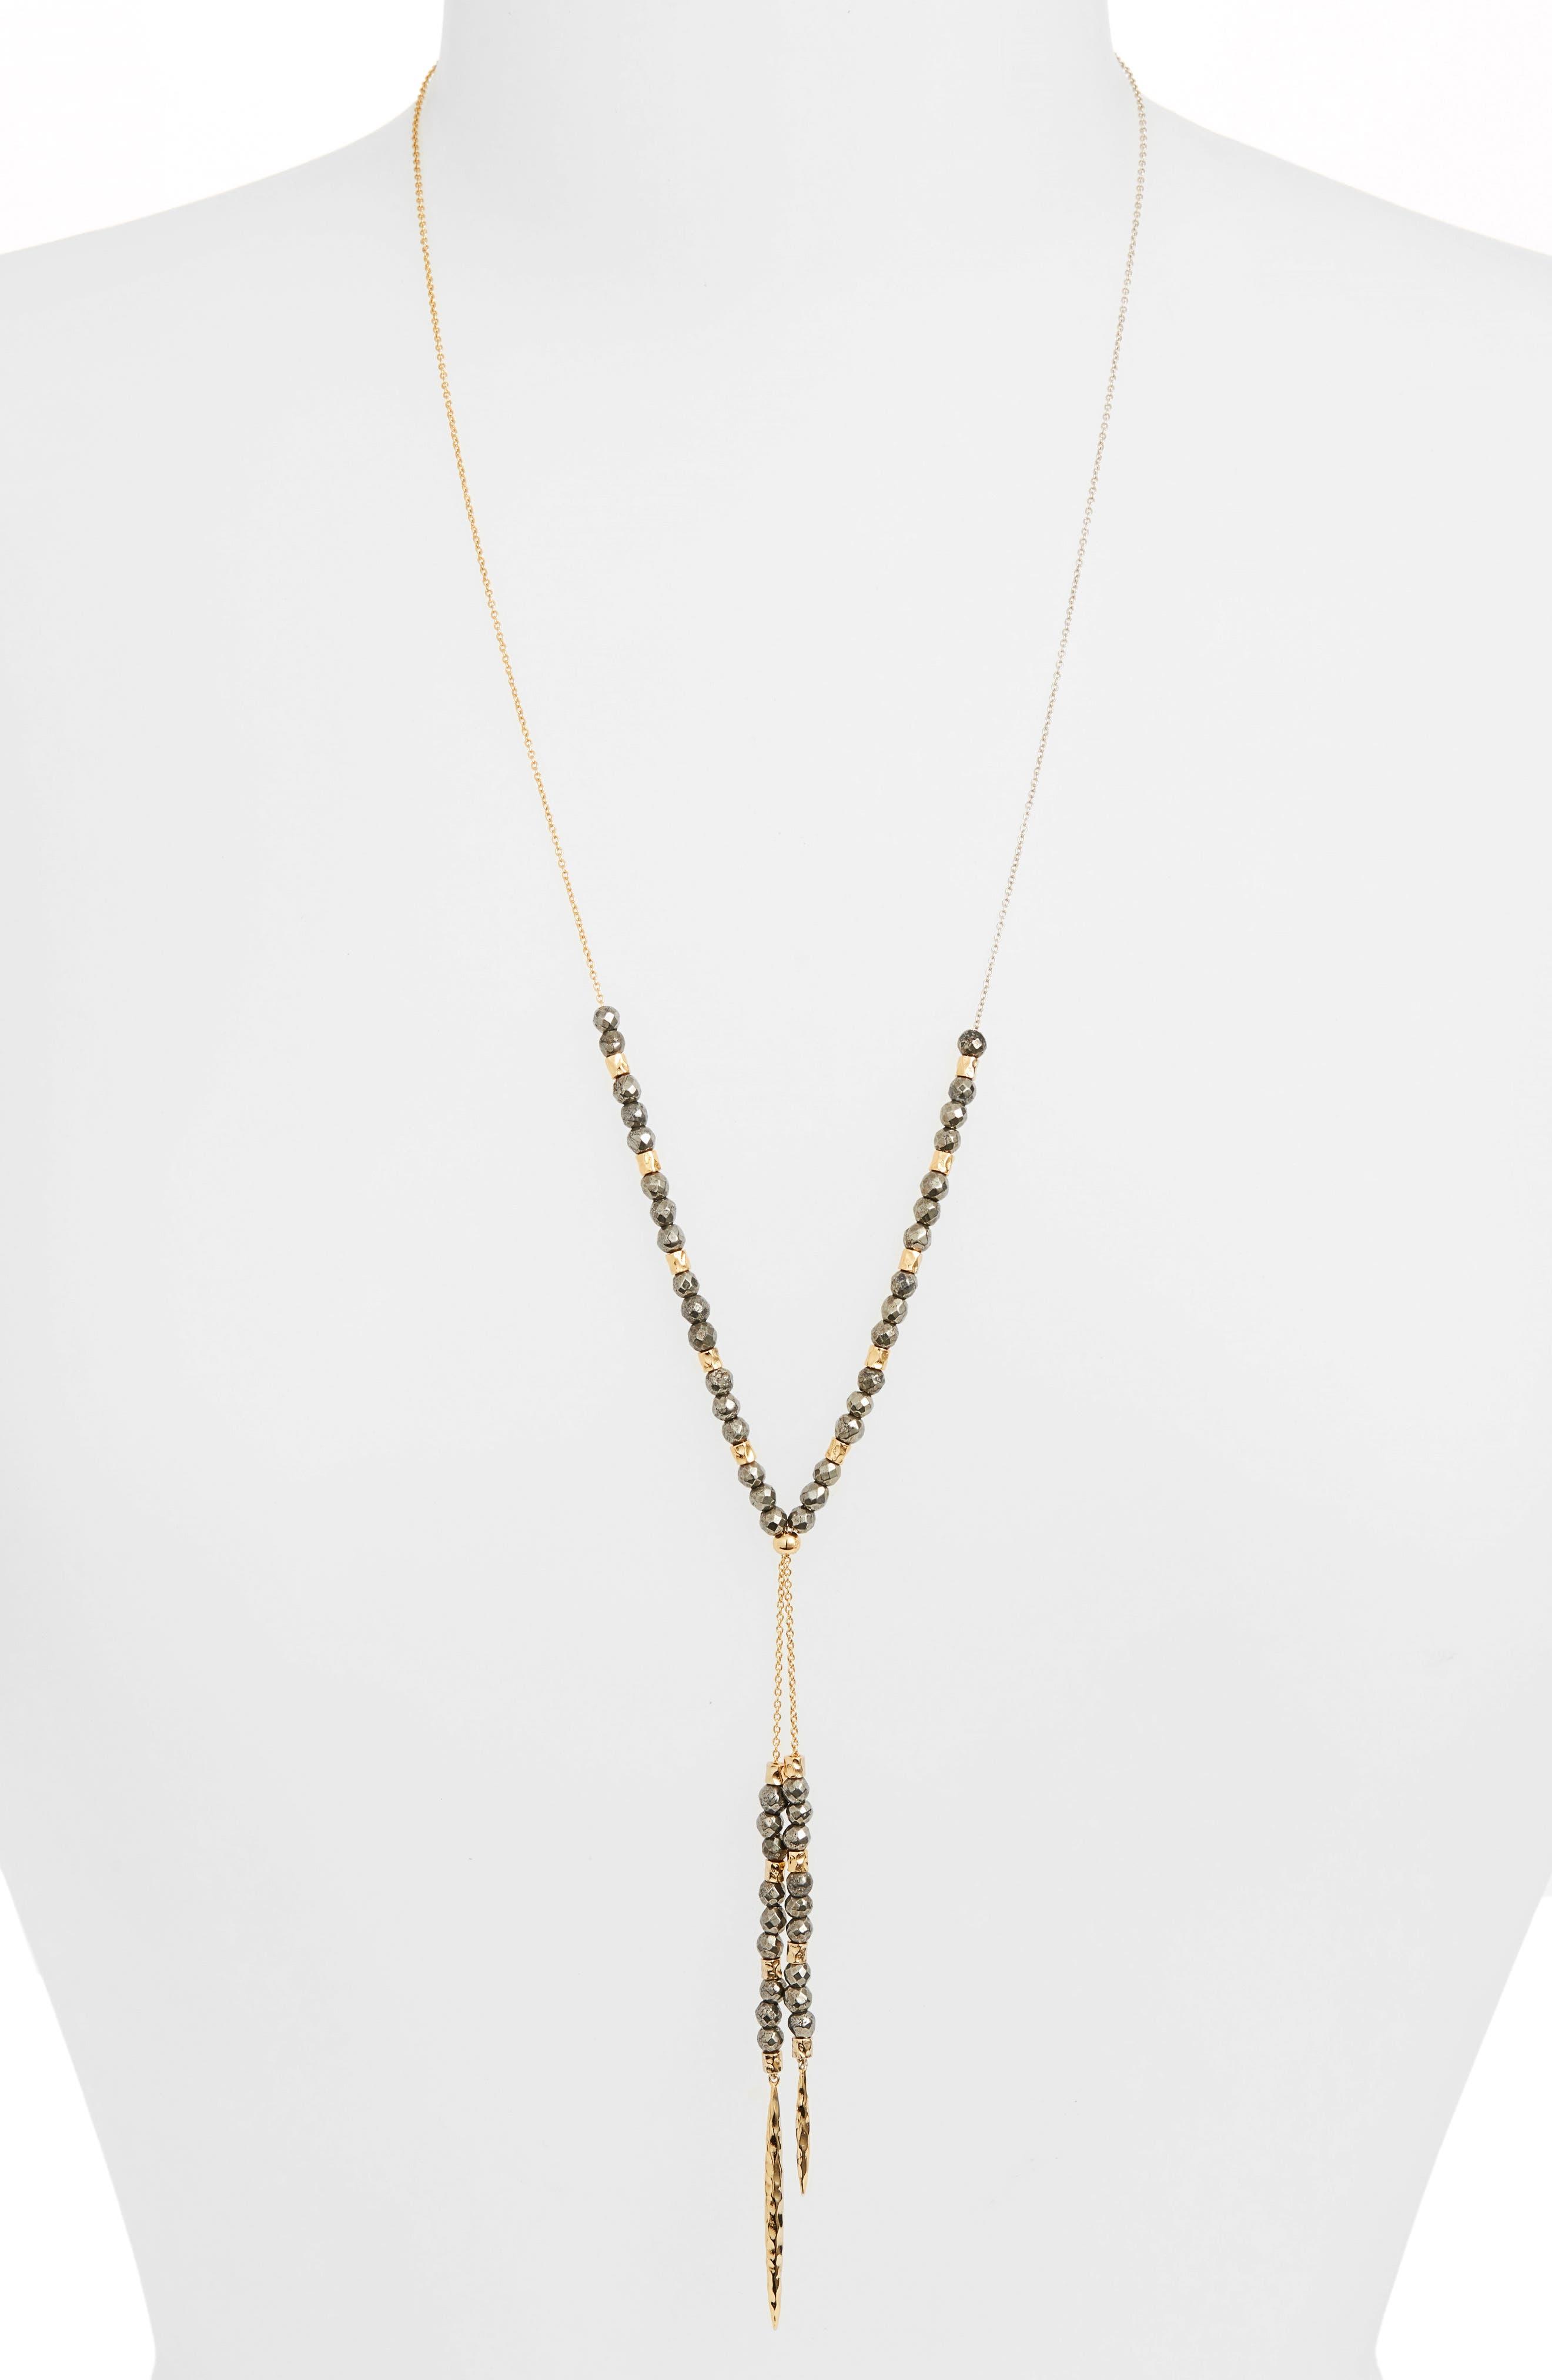 Main Image - gorjana Power Stone Semiprecious Stone Necklace